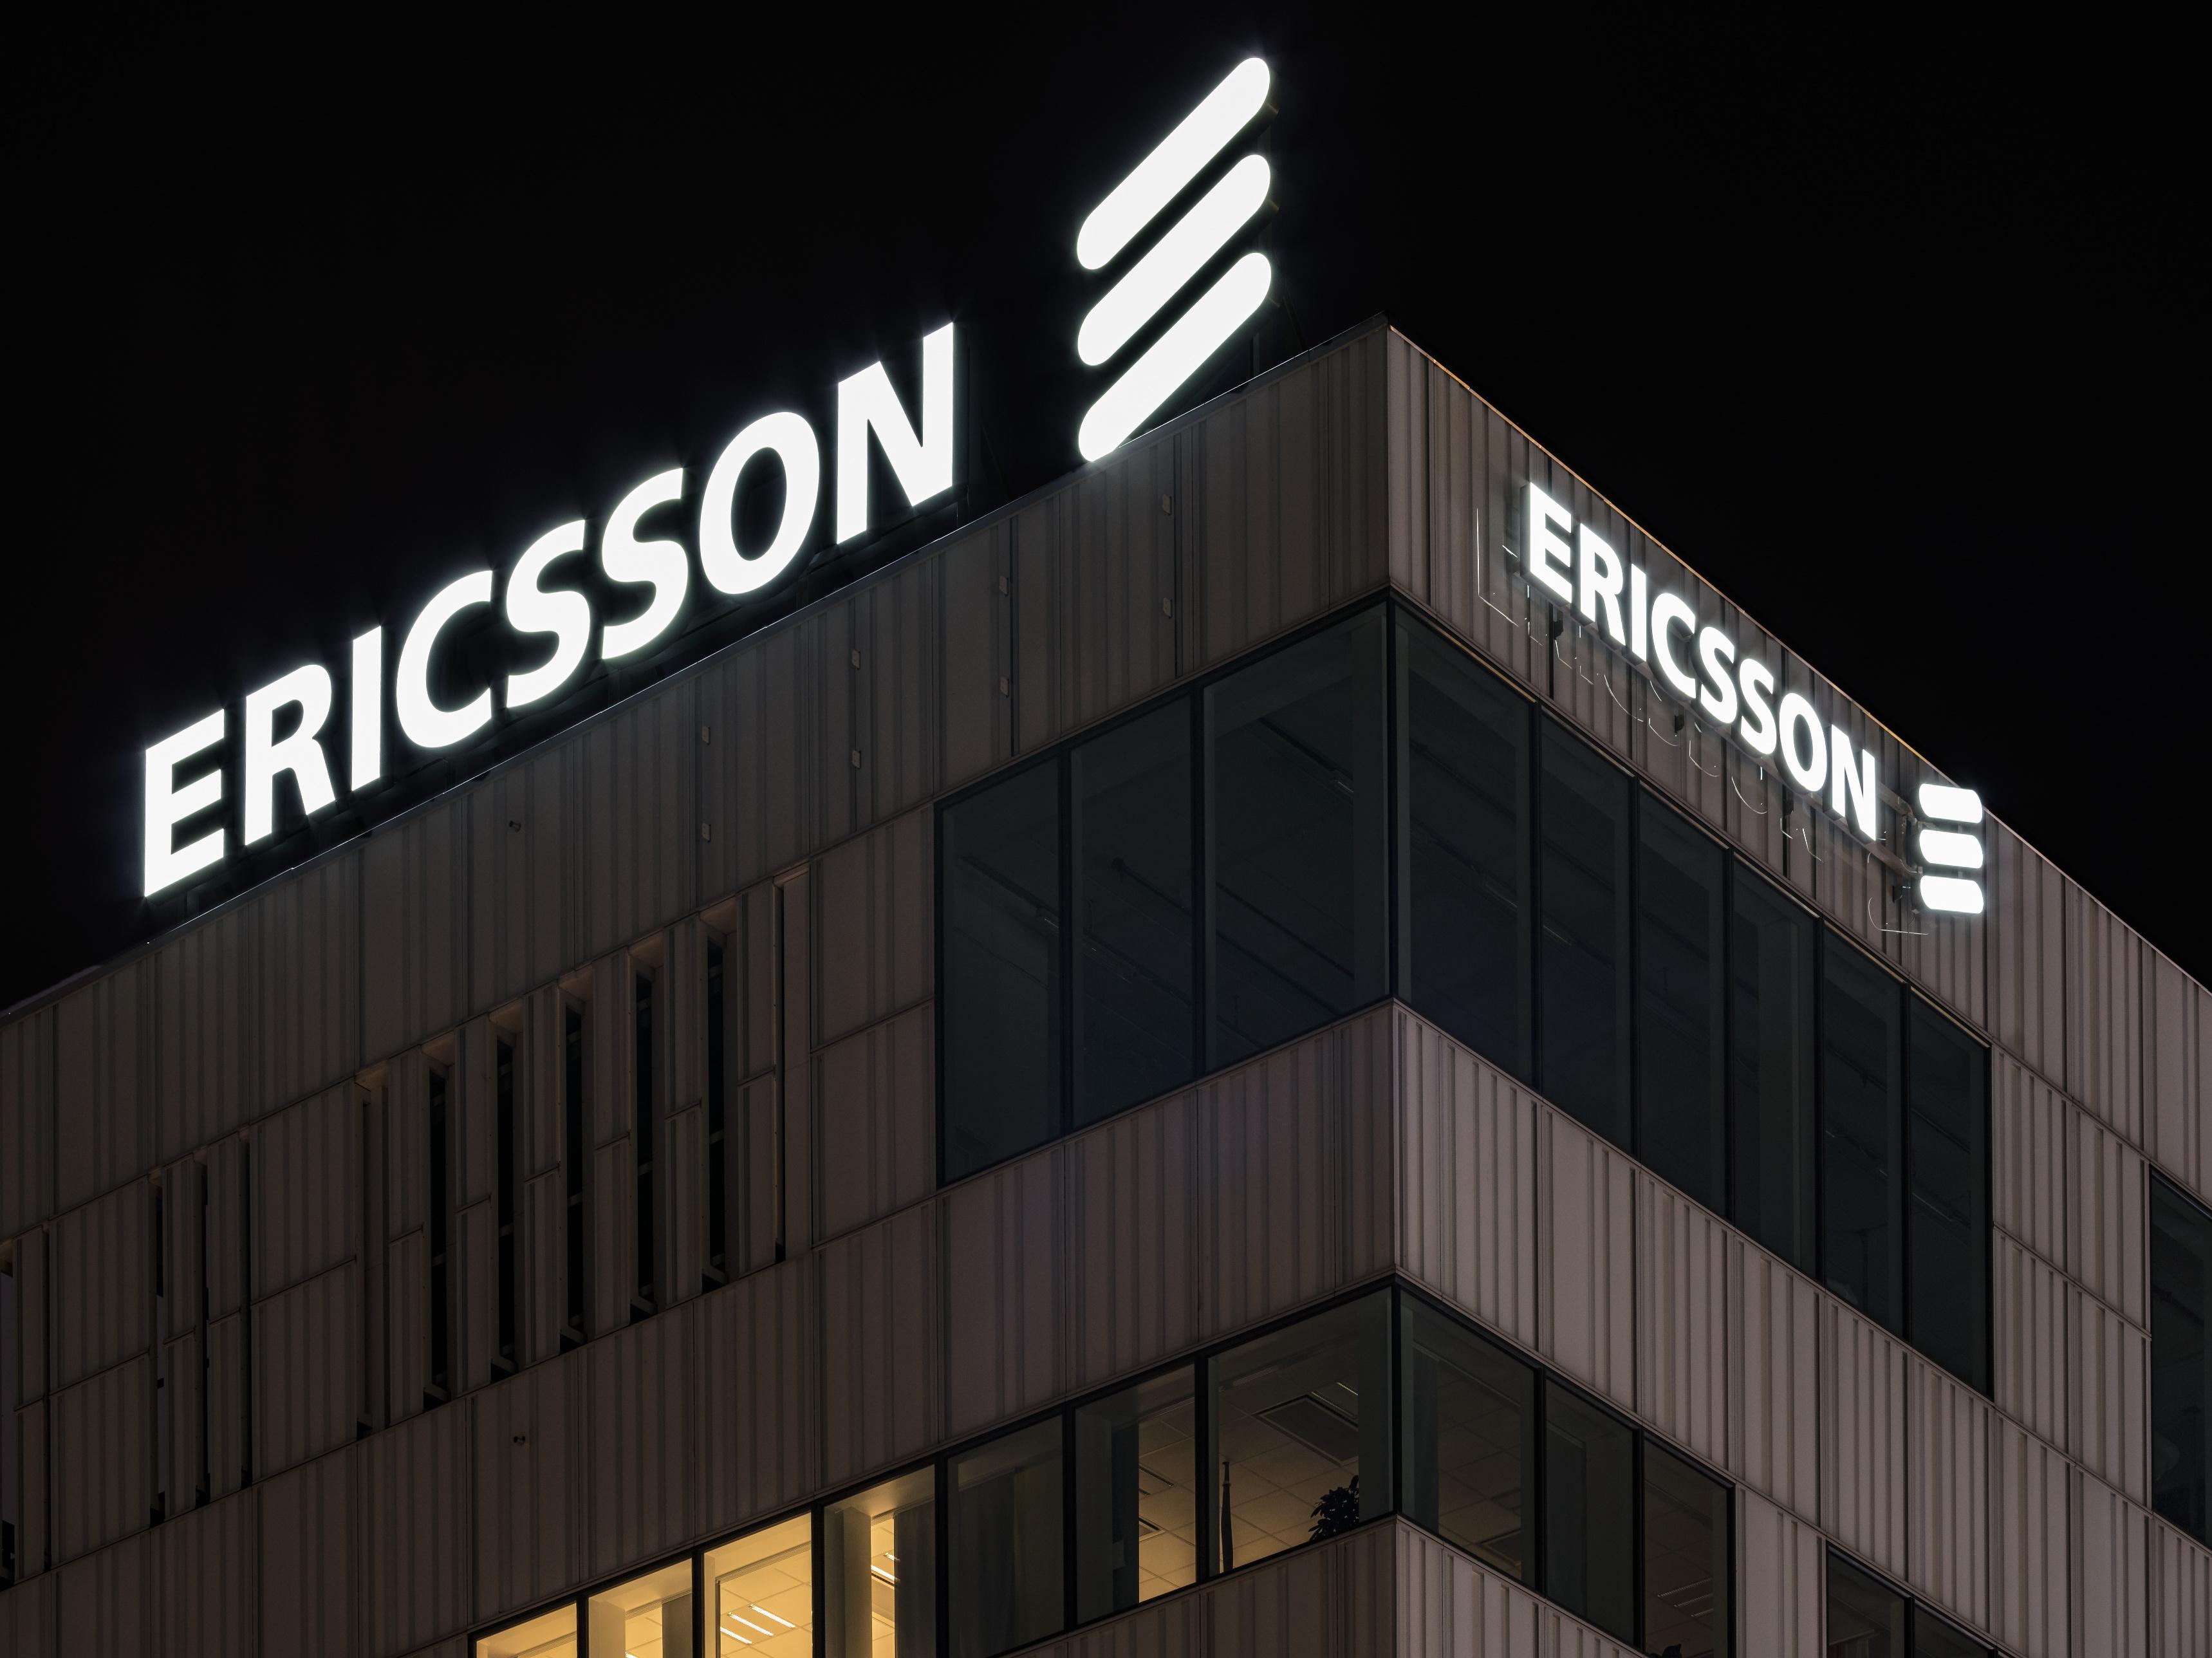 Ericsson logo on HQ building.